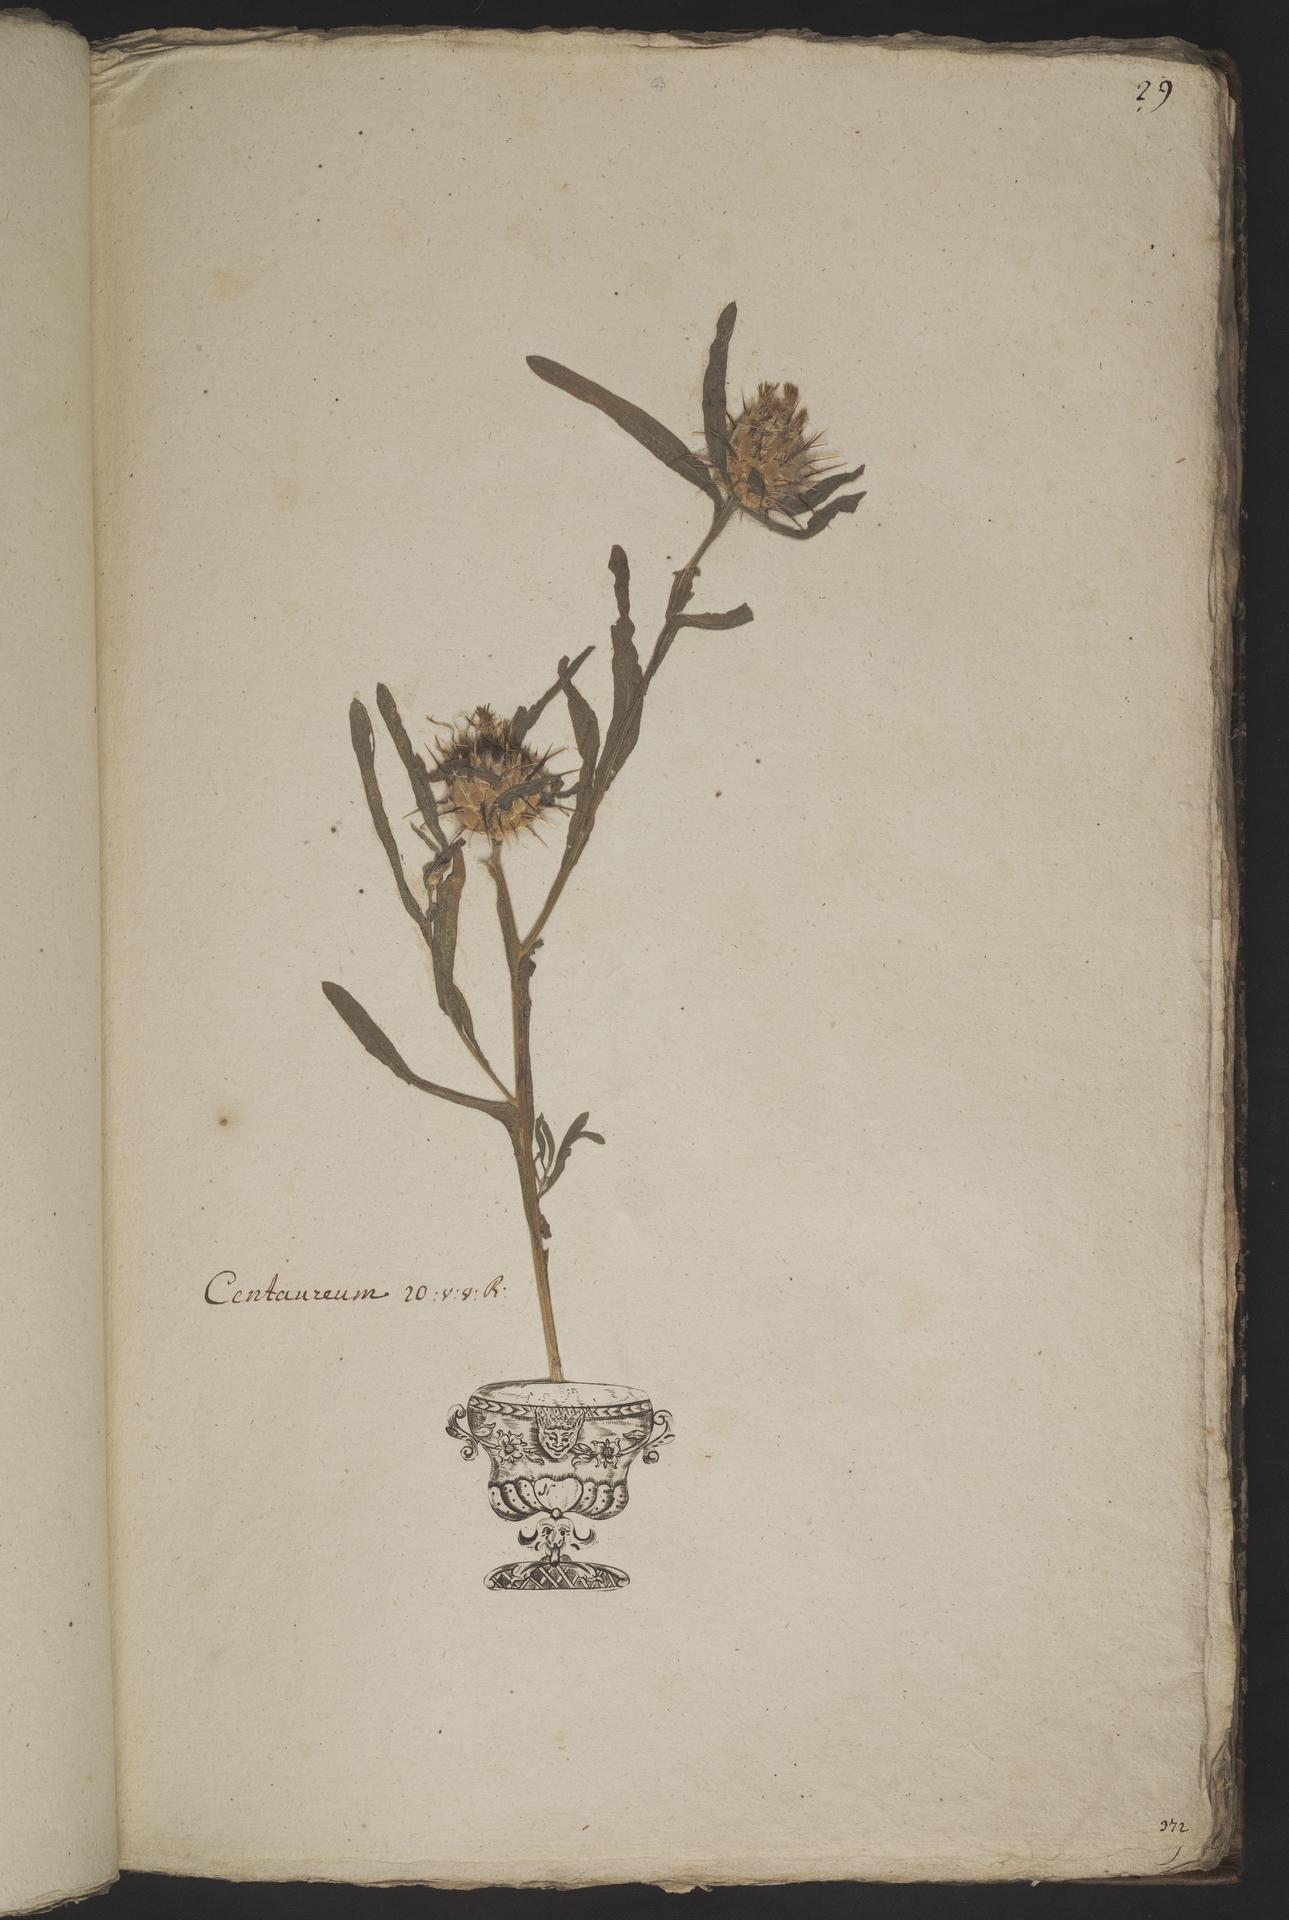 L.3961021 | Centaurea melitensis L.